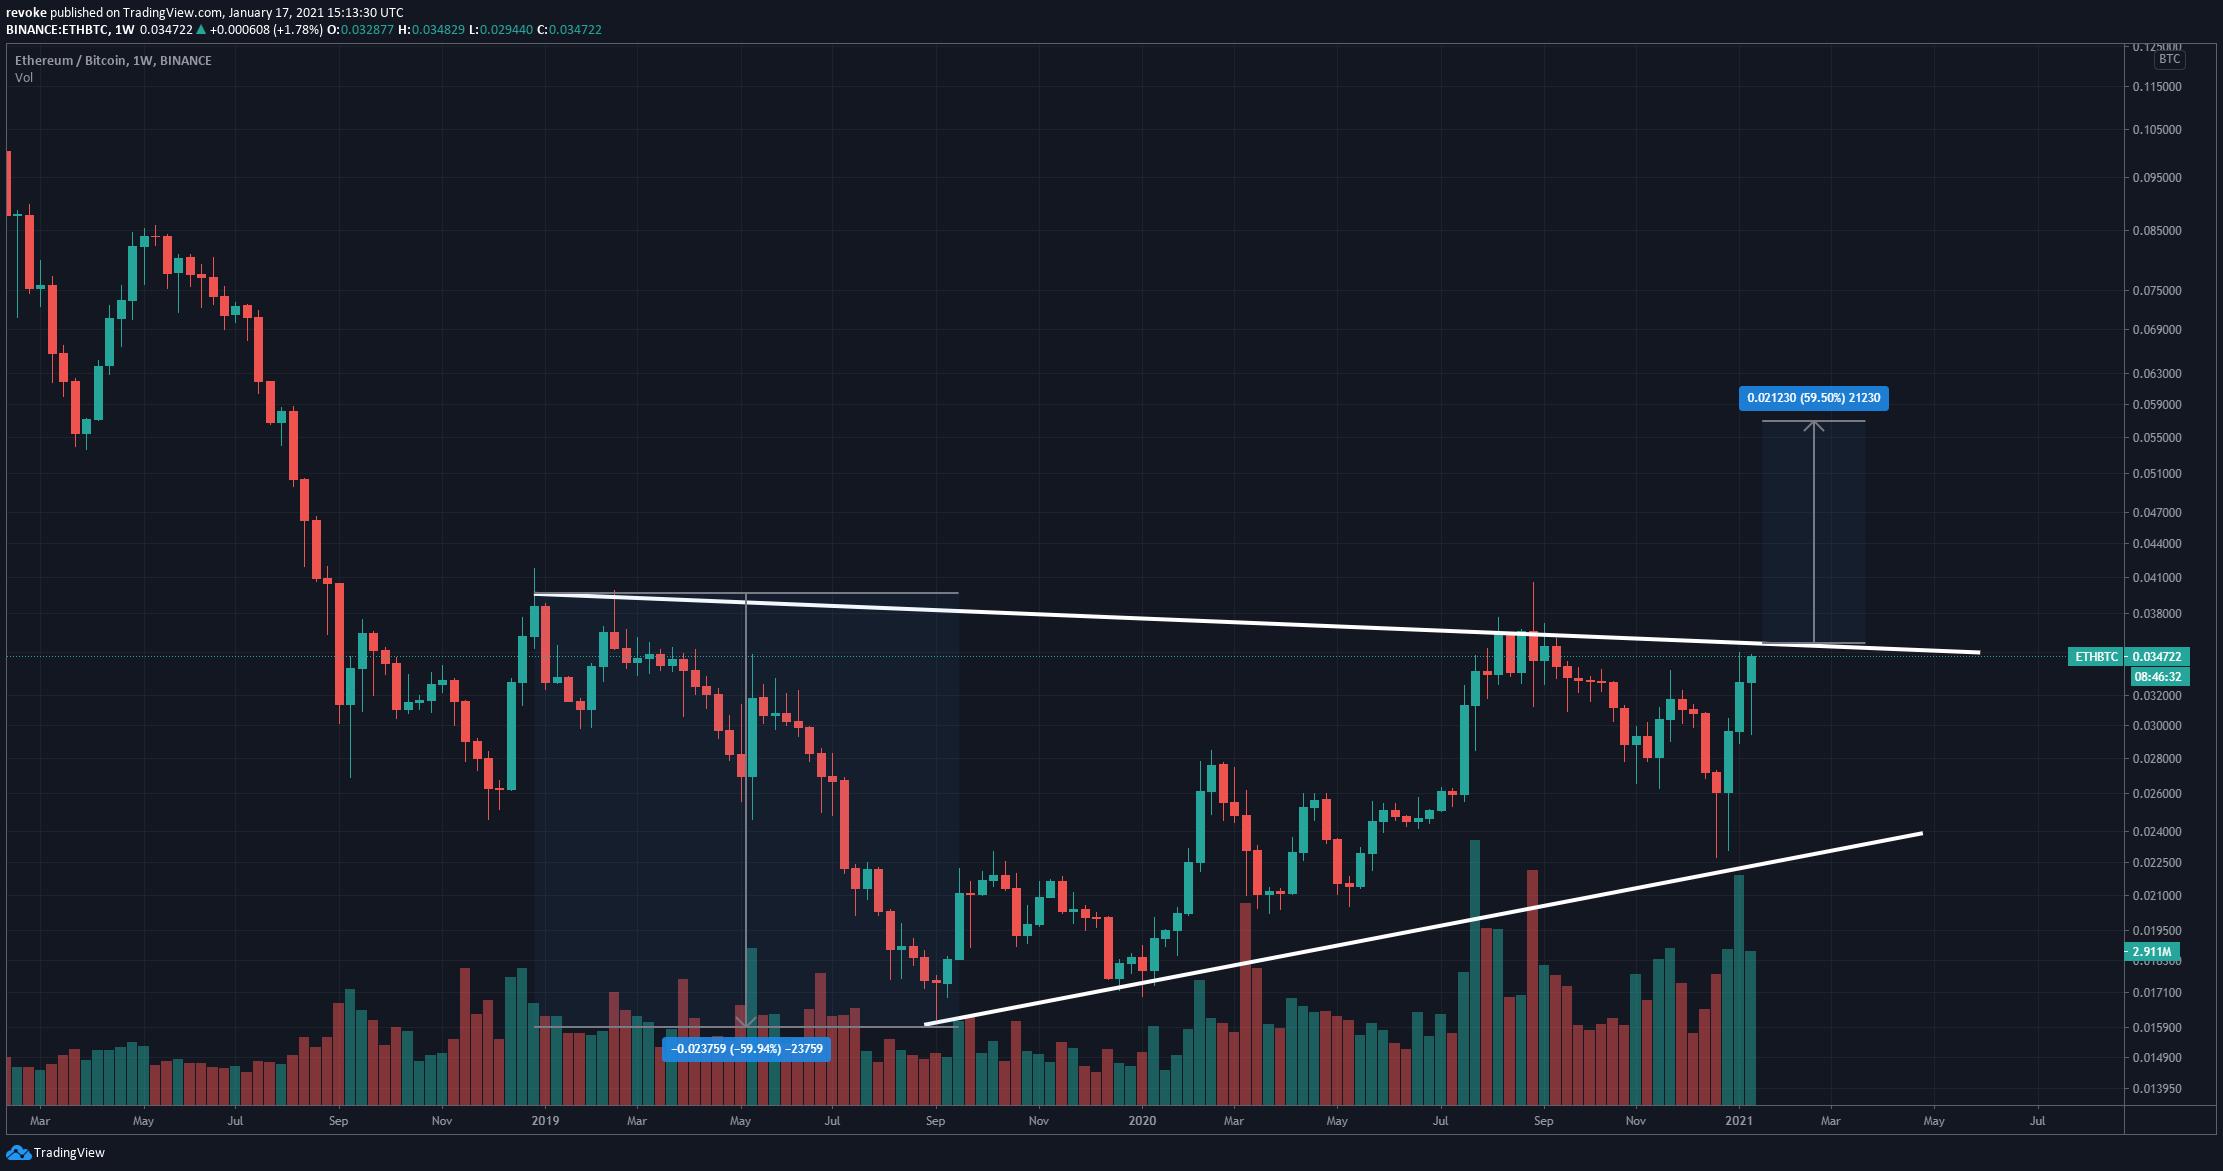 ETH/BTC Wochenchart - TradingView